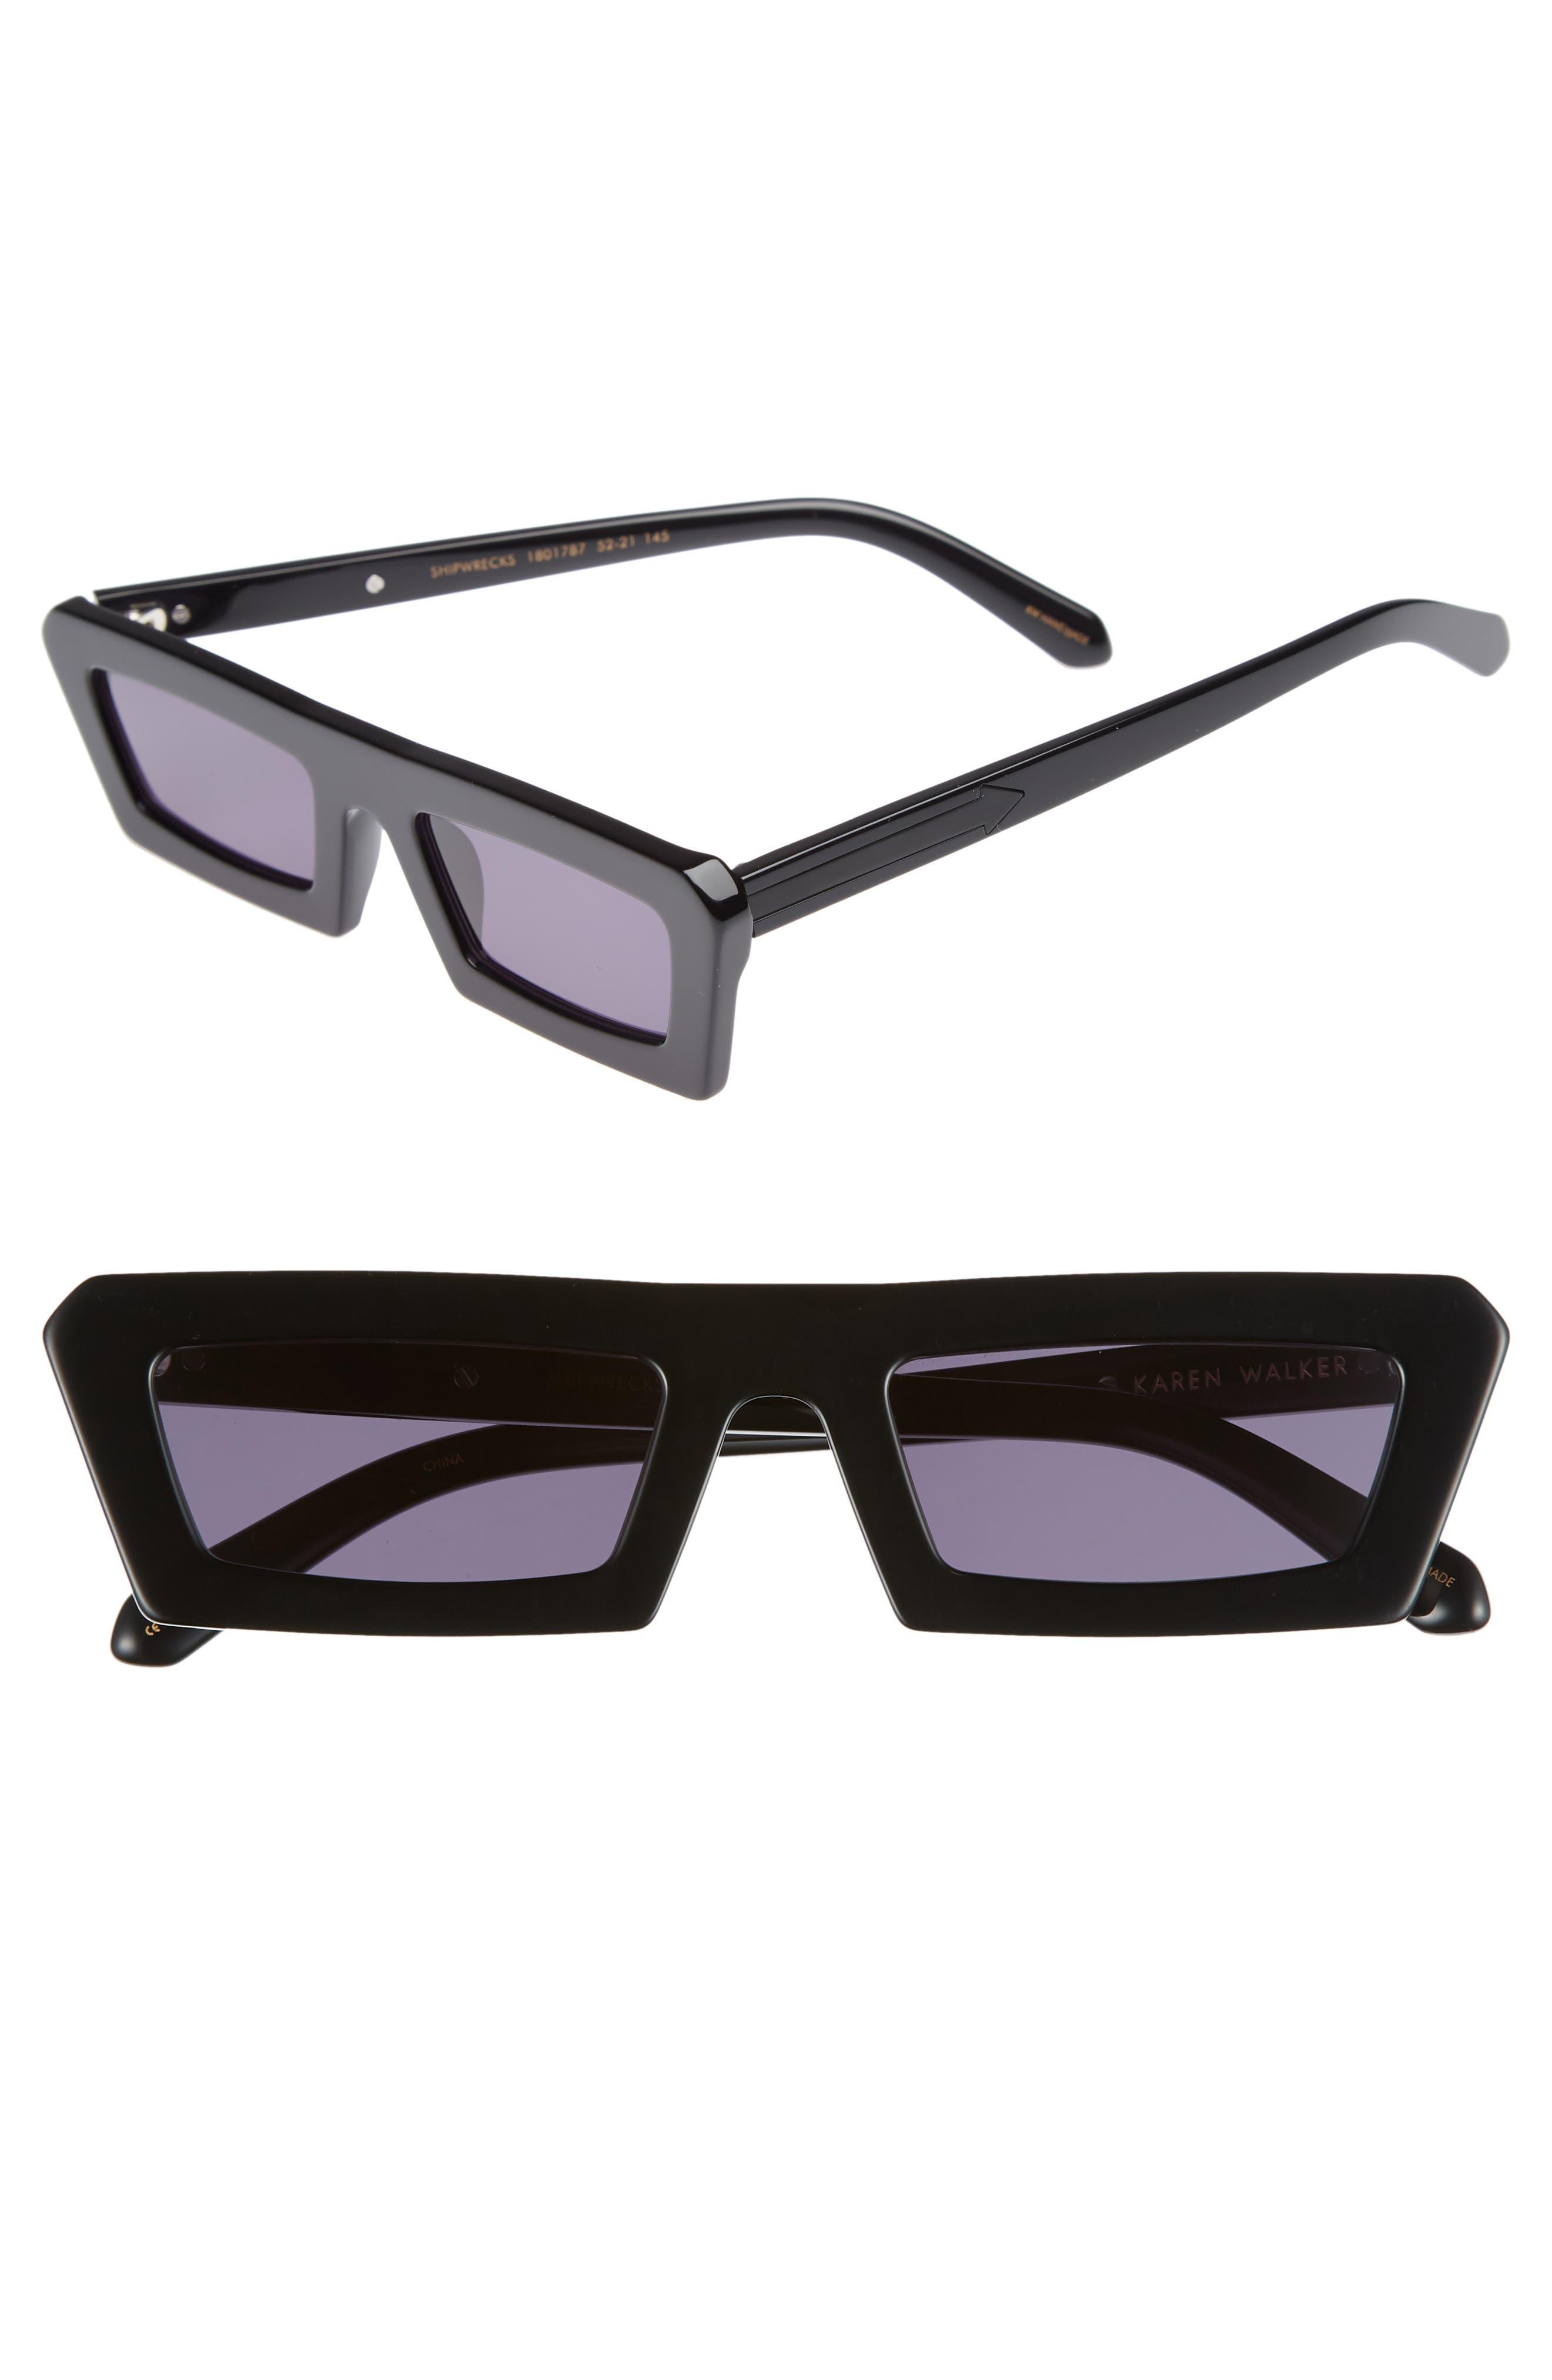 Shipwrecks 52mm Square Sunglasses,                         Main,                         color, BLACK/ SMOKE